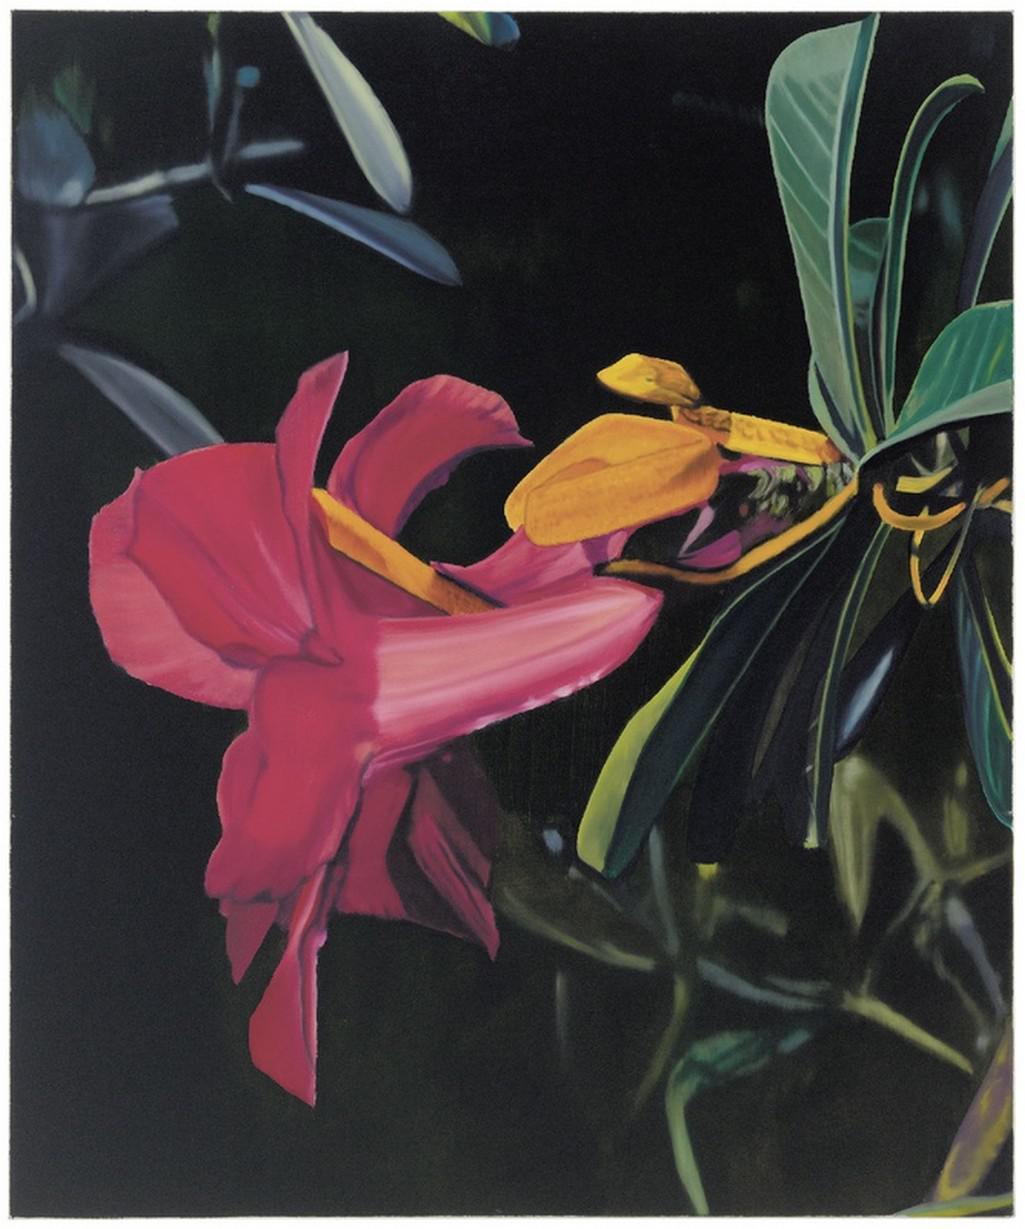 Eberhard Havekost / Poison (Jed), B14, 2014